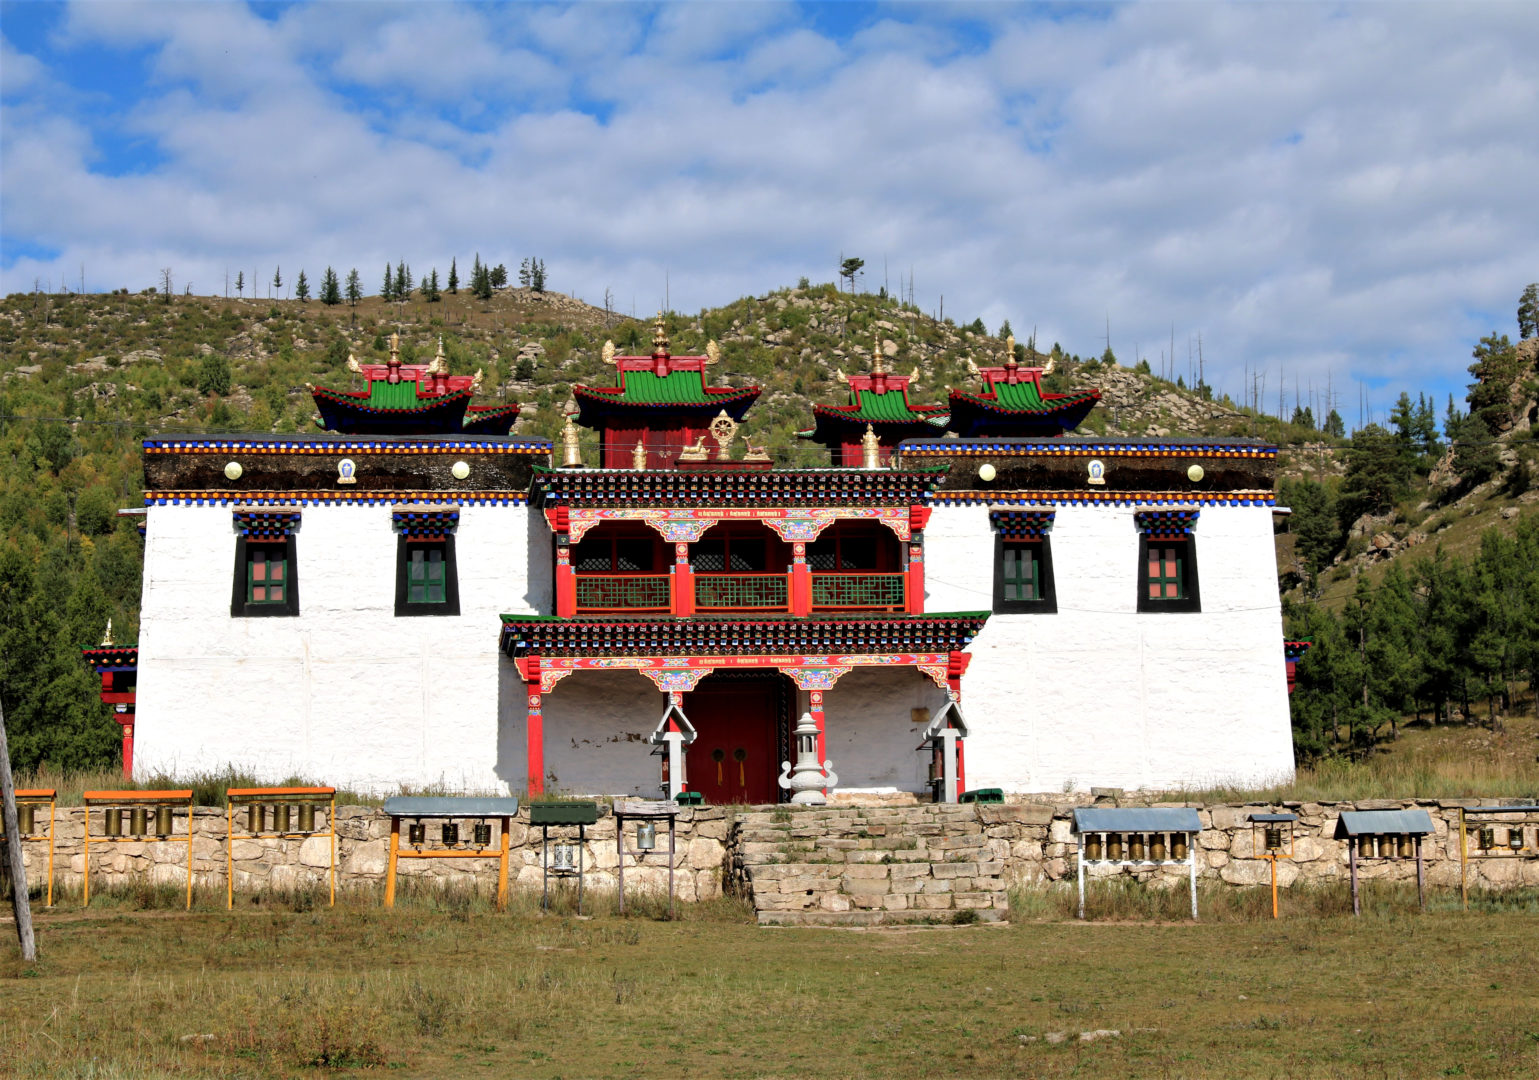 Tempel im Osten der Mongolei